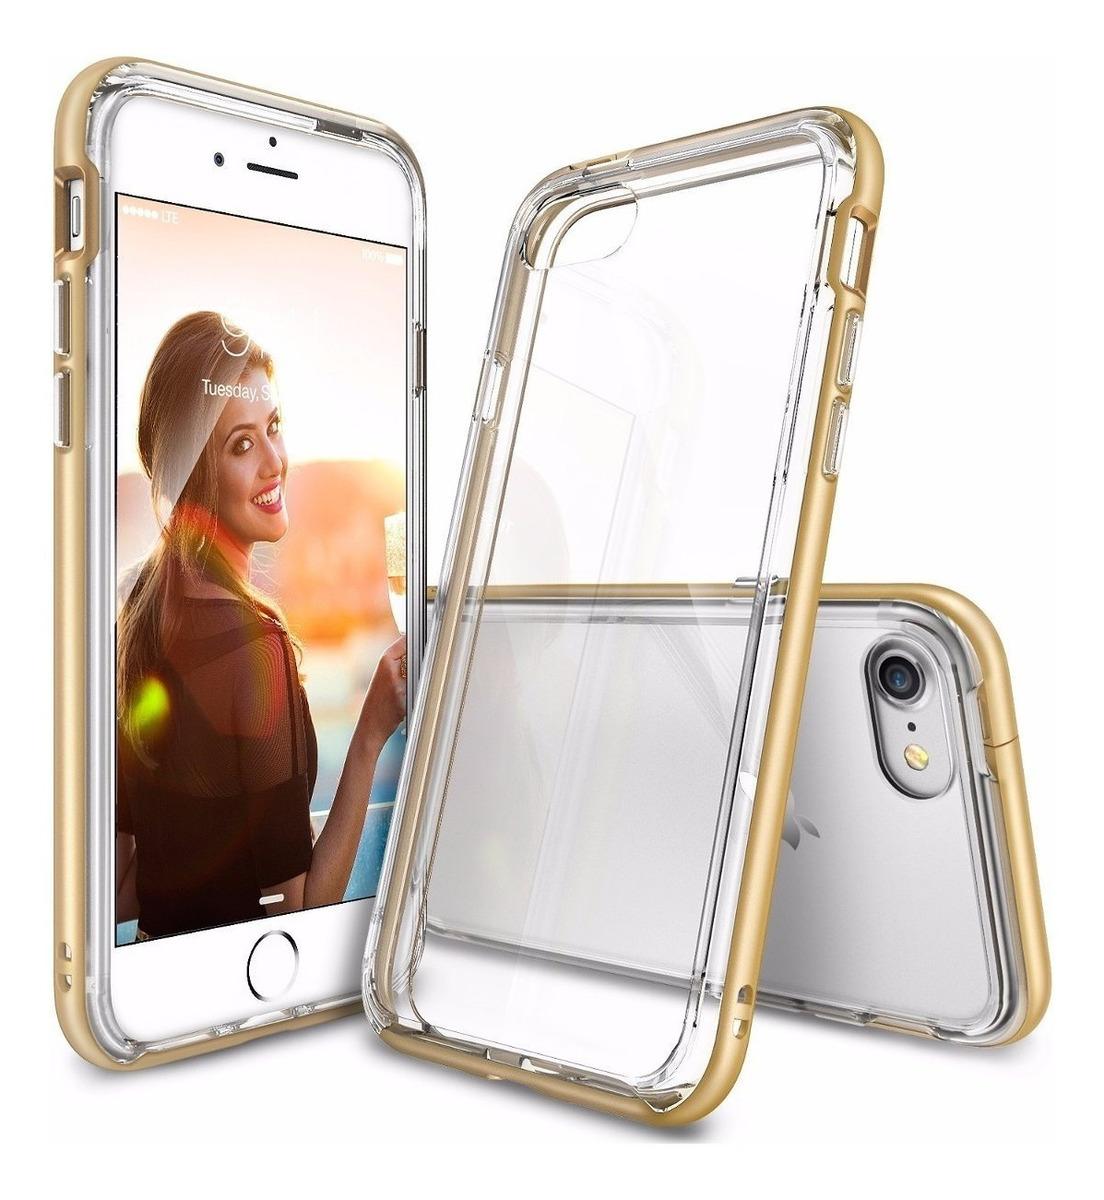 cf590e71f80 Funda Ringke Frame Original iPhone 8 & iPhone 8 Plus - $ 550,00 ...